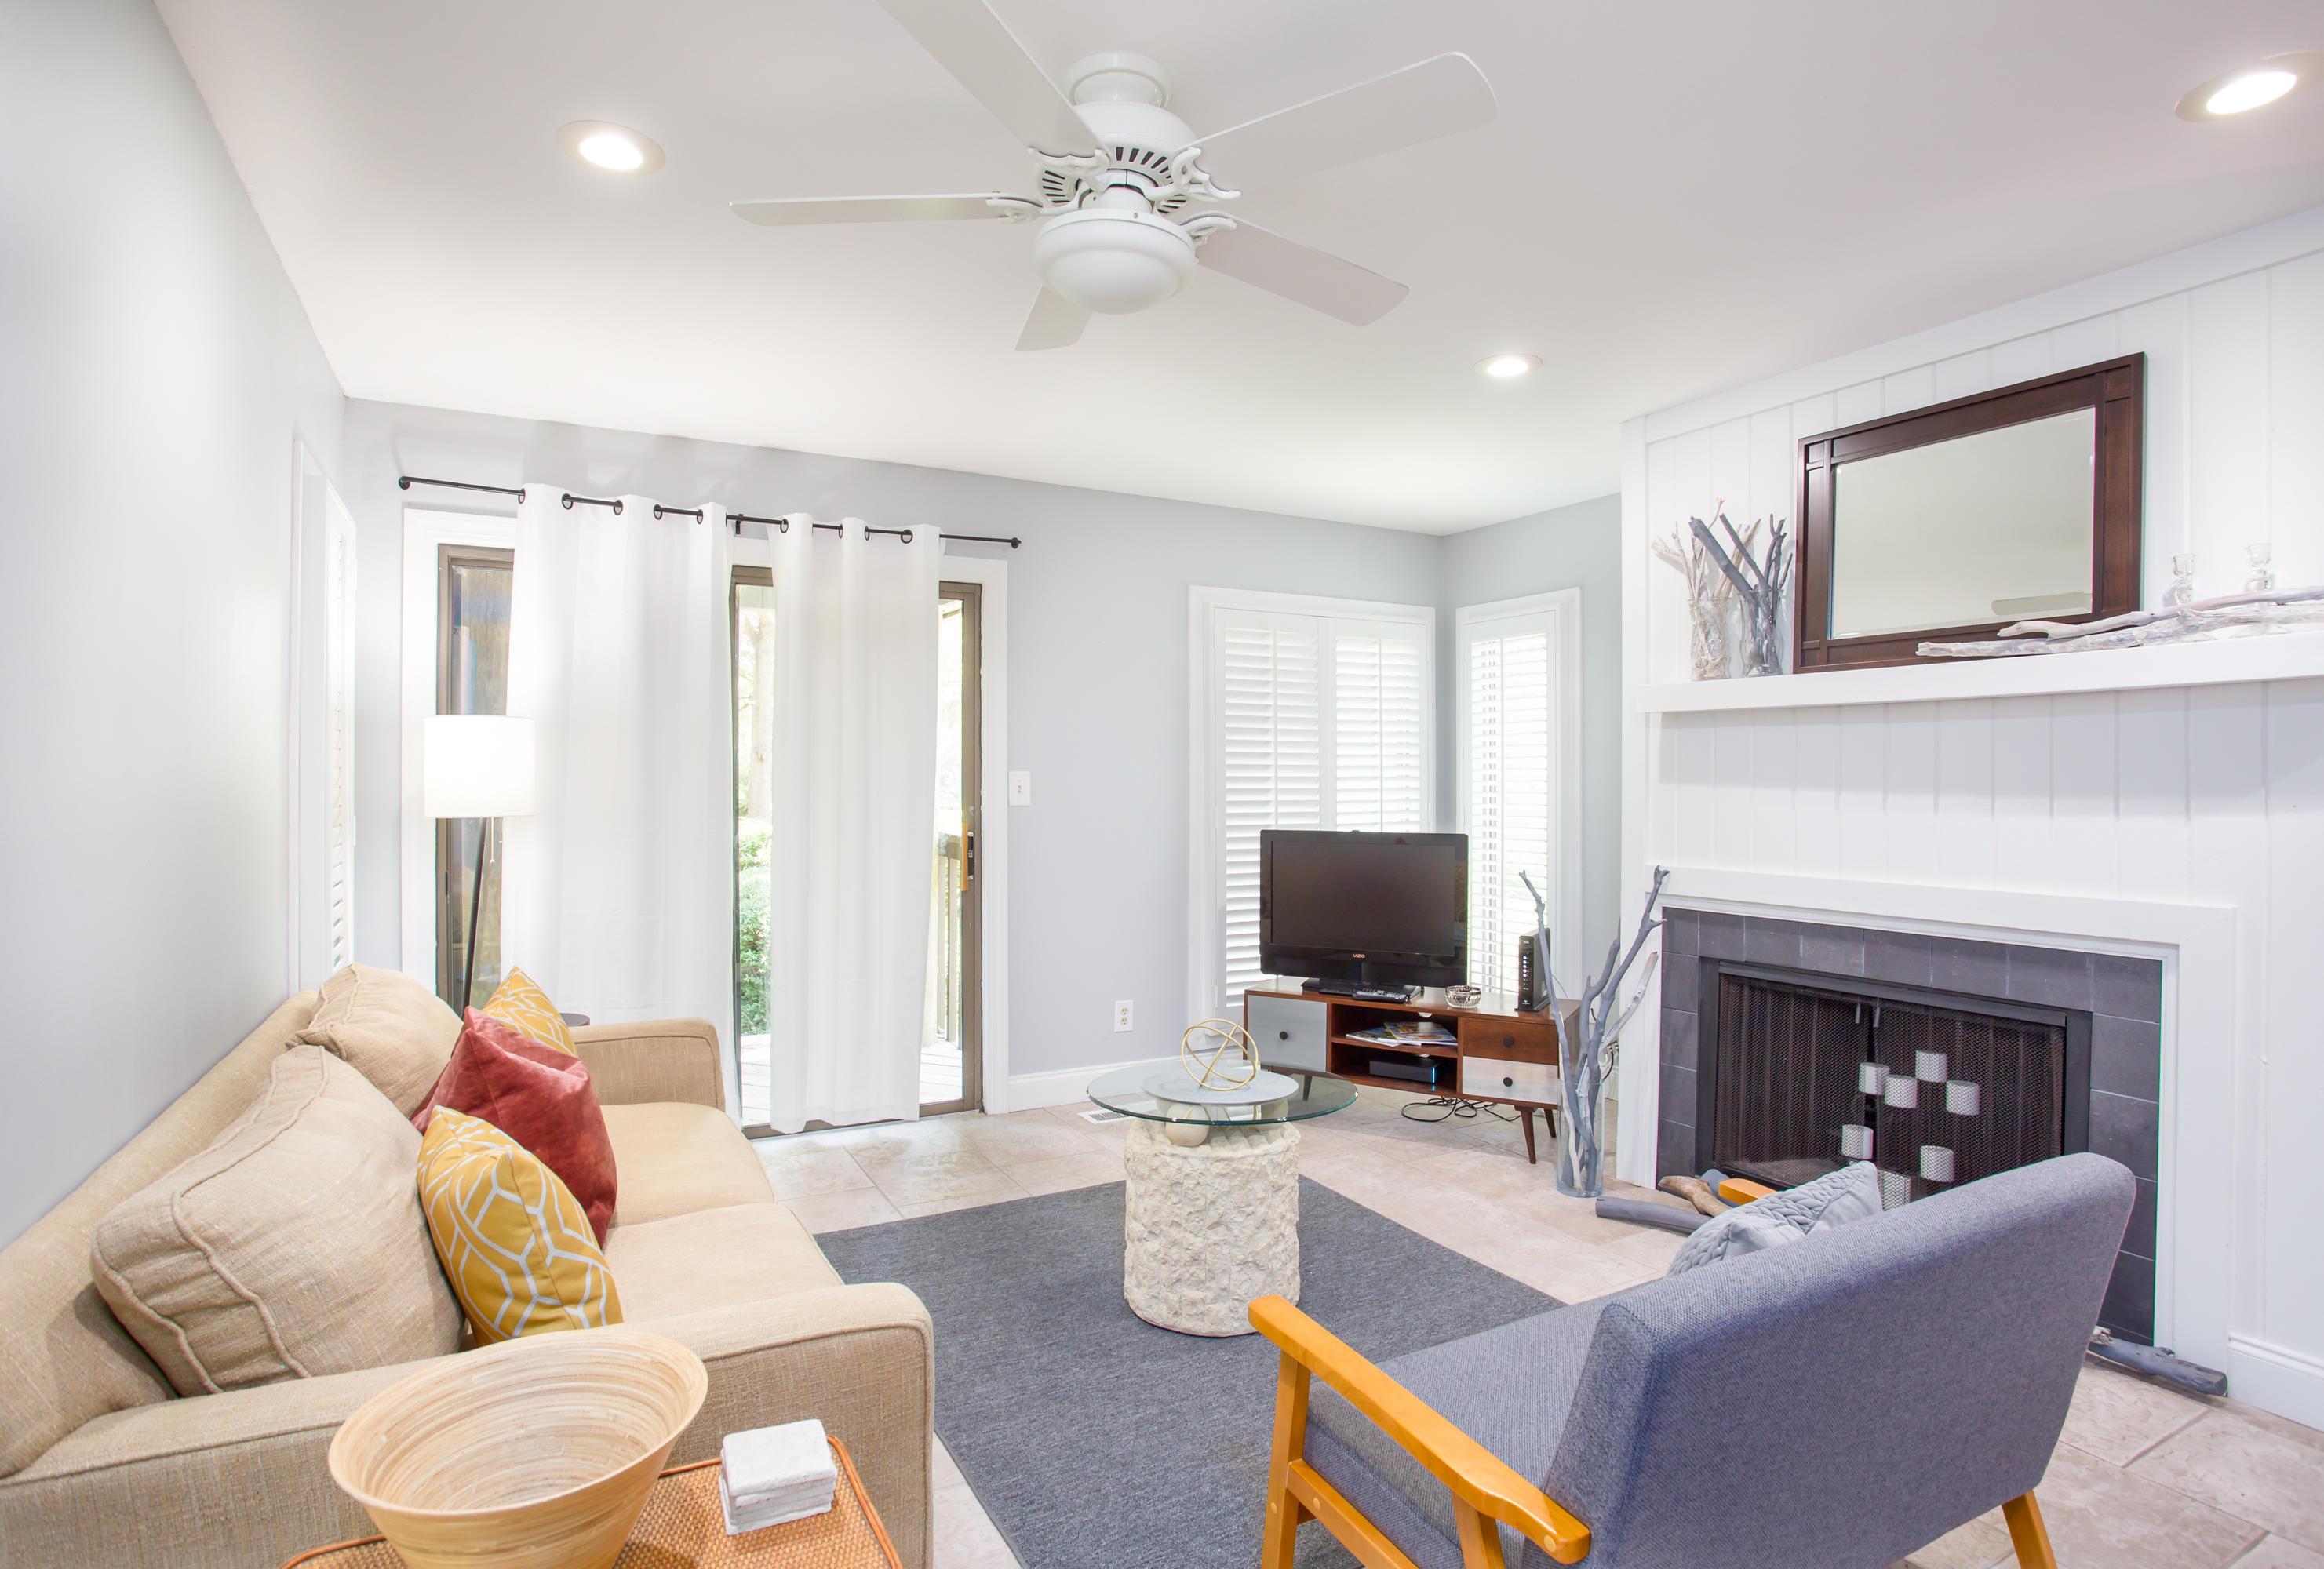 Kiawah Island Homes For Sale - 4523 Park Lake, Kiawah Island, SC - 15